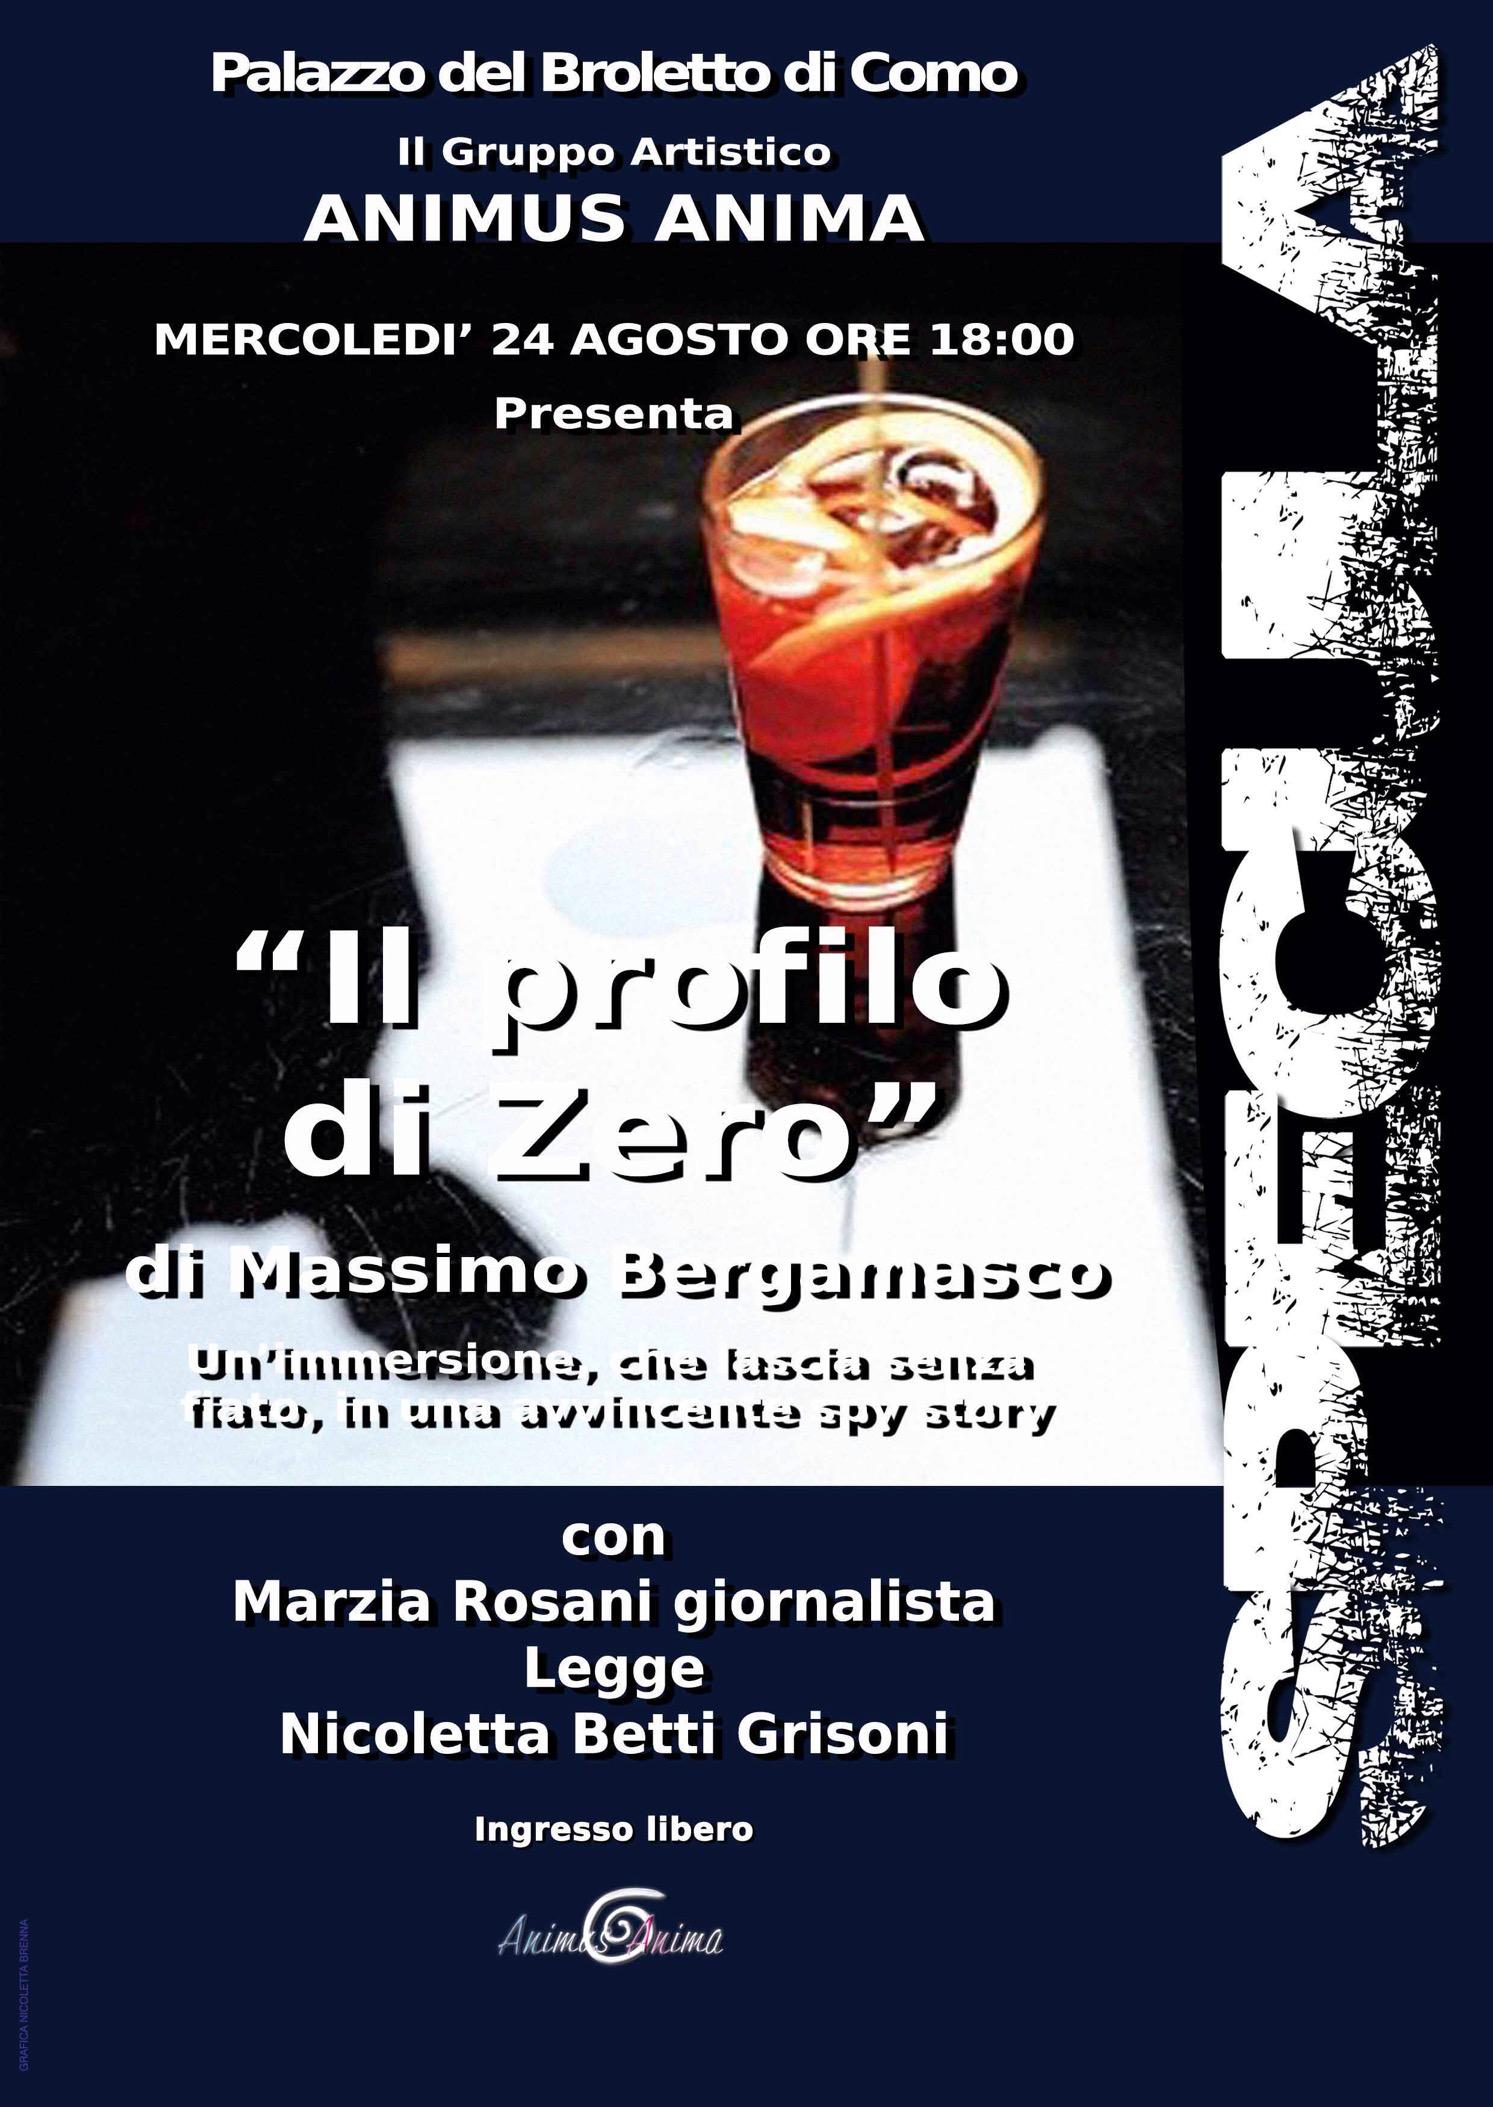 http://www.notiziariodelleassociazioni.it/site/wp-content/uploads/2016/08/bergamasco.jpg